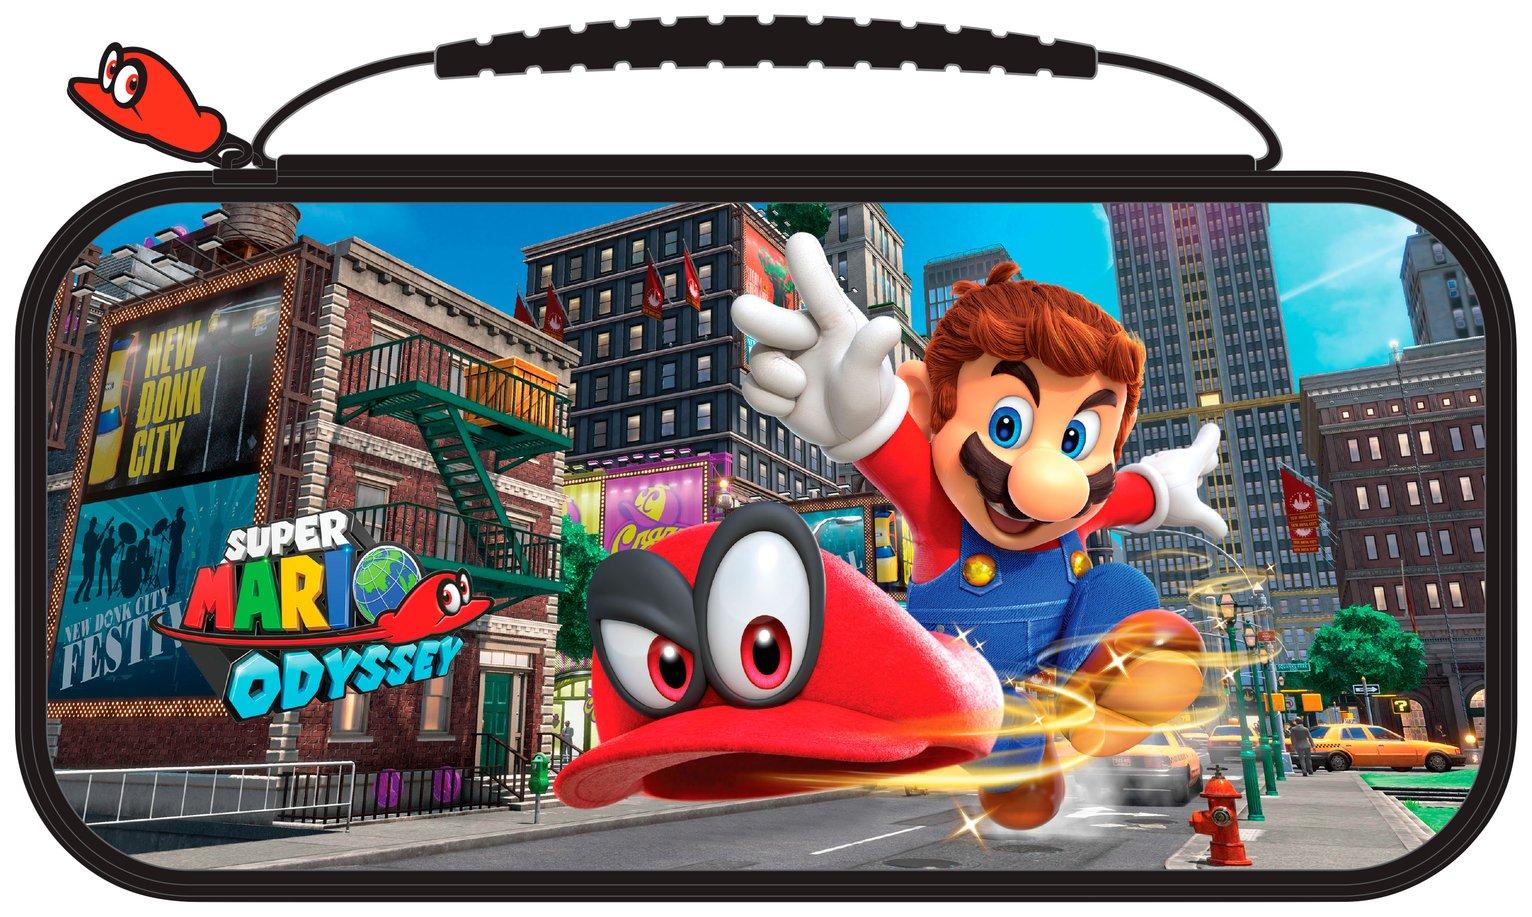 Etuit de Transport Super Mario Odyssey Nintendo Switch